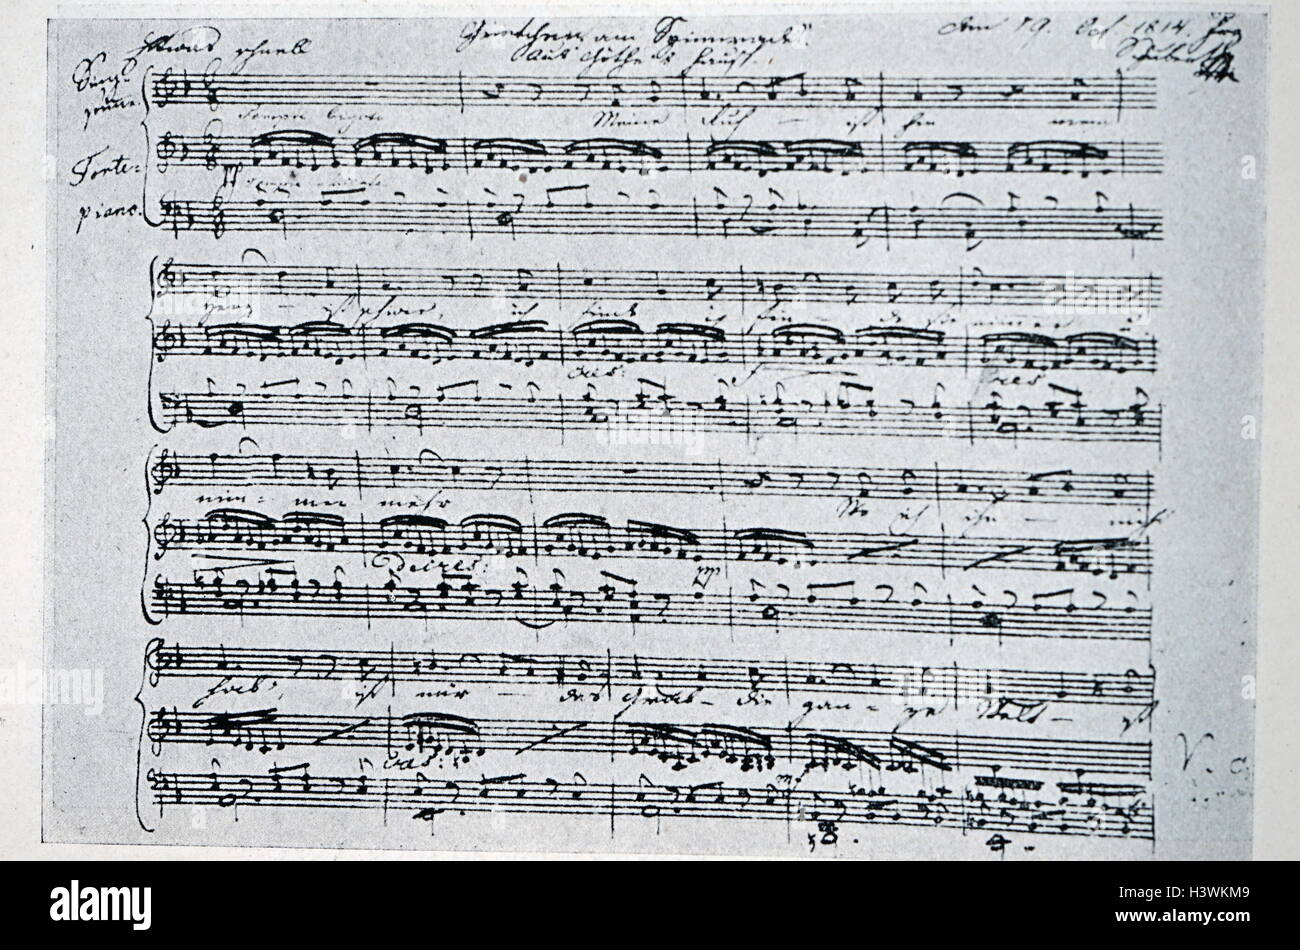 Gretchen am Spinnrade by Franz Schubert (1797-1828) an Austrian composer. Dated 19th Century Stock Photo